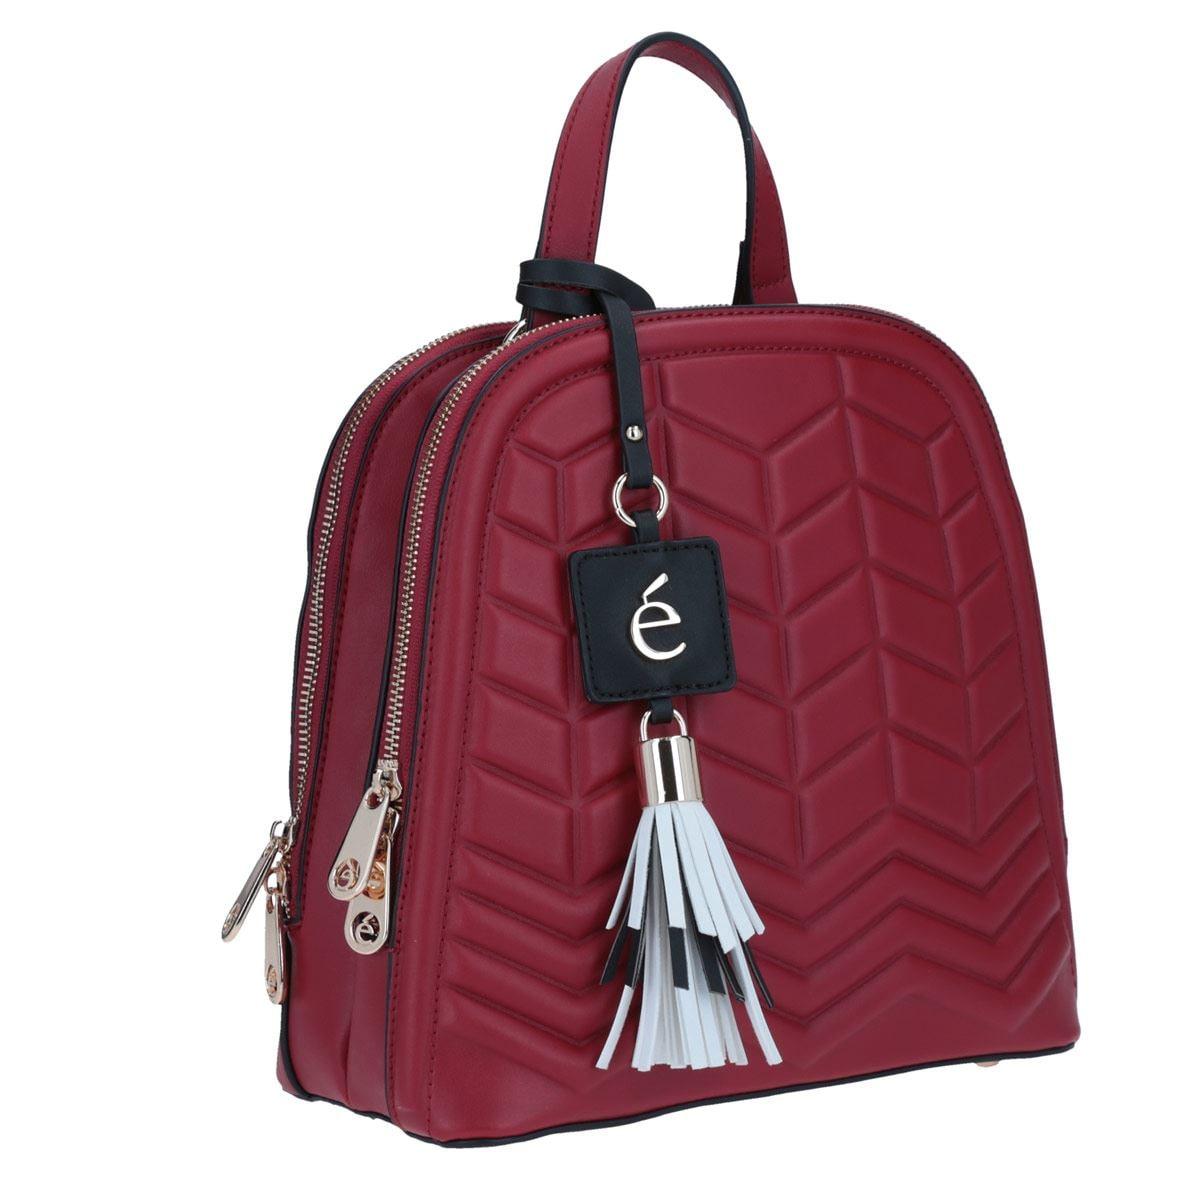 Bolos Back Pack Mediana Color Rojo Gorétt